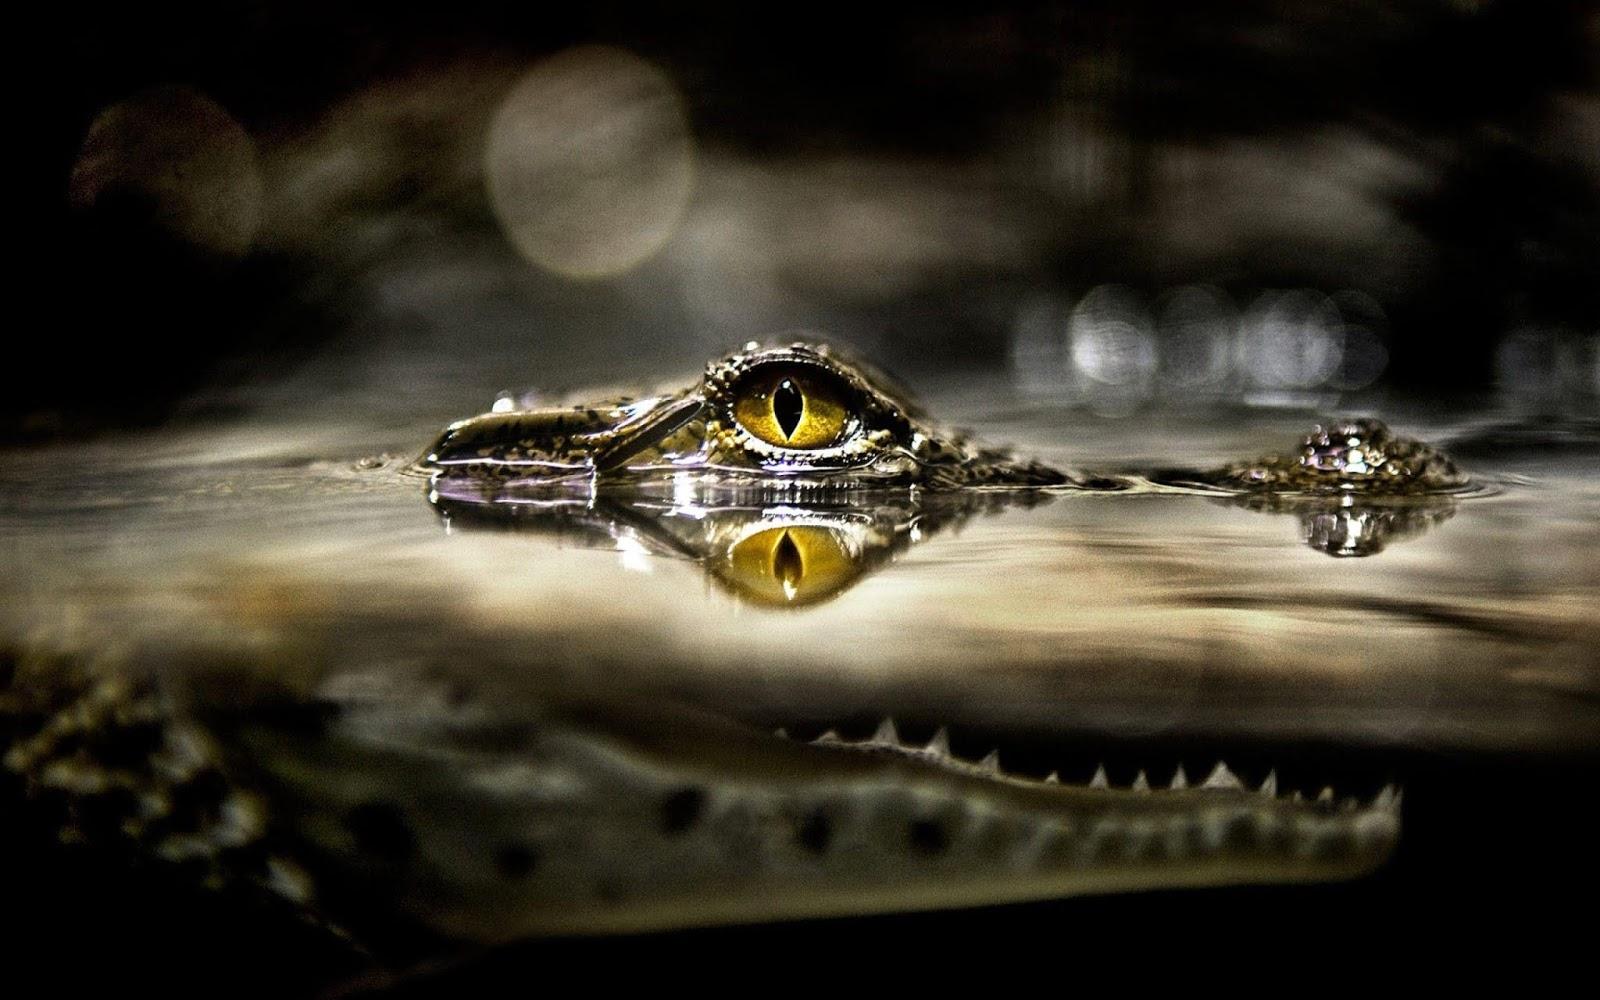 Alligator HD wallpapers eye